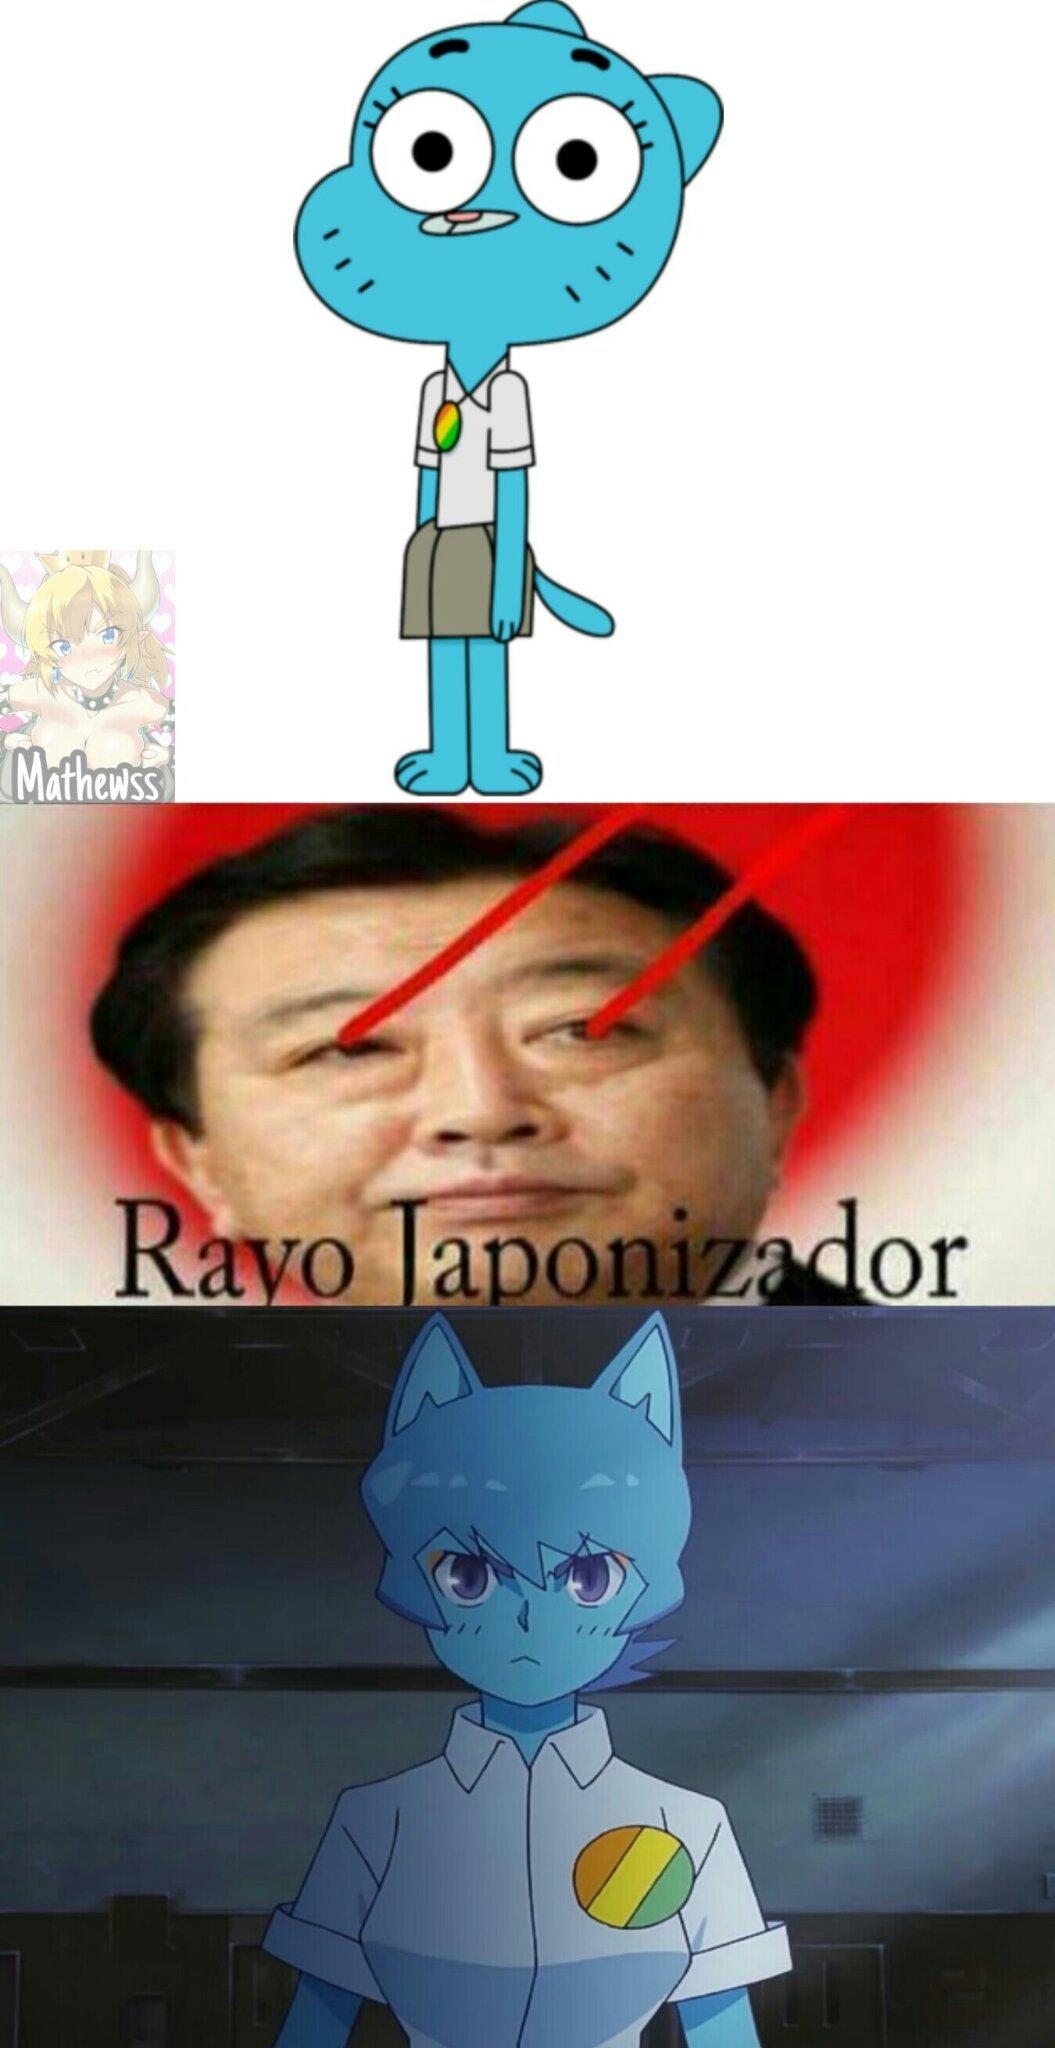 RAYO JAPONIZADOR!! - meme